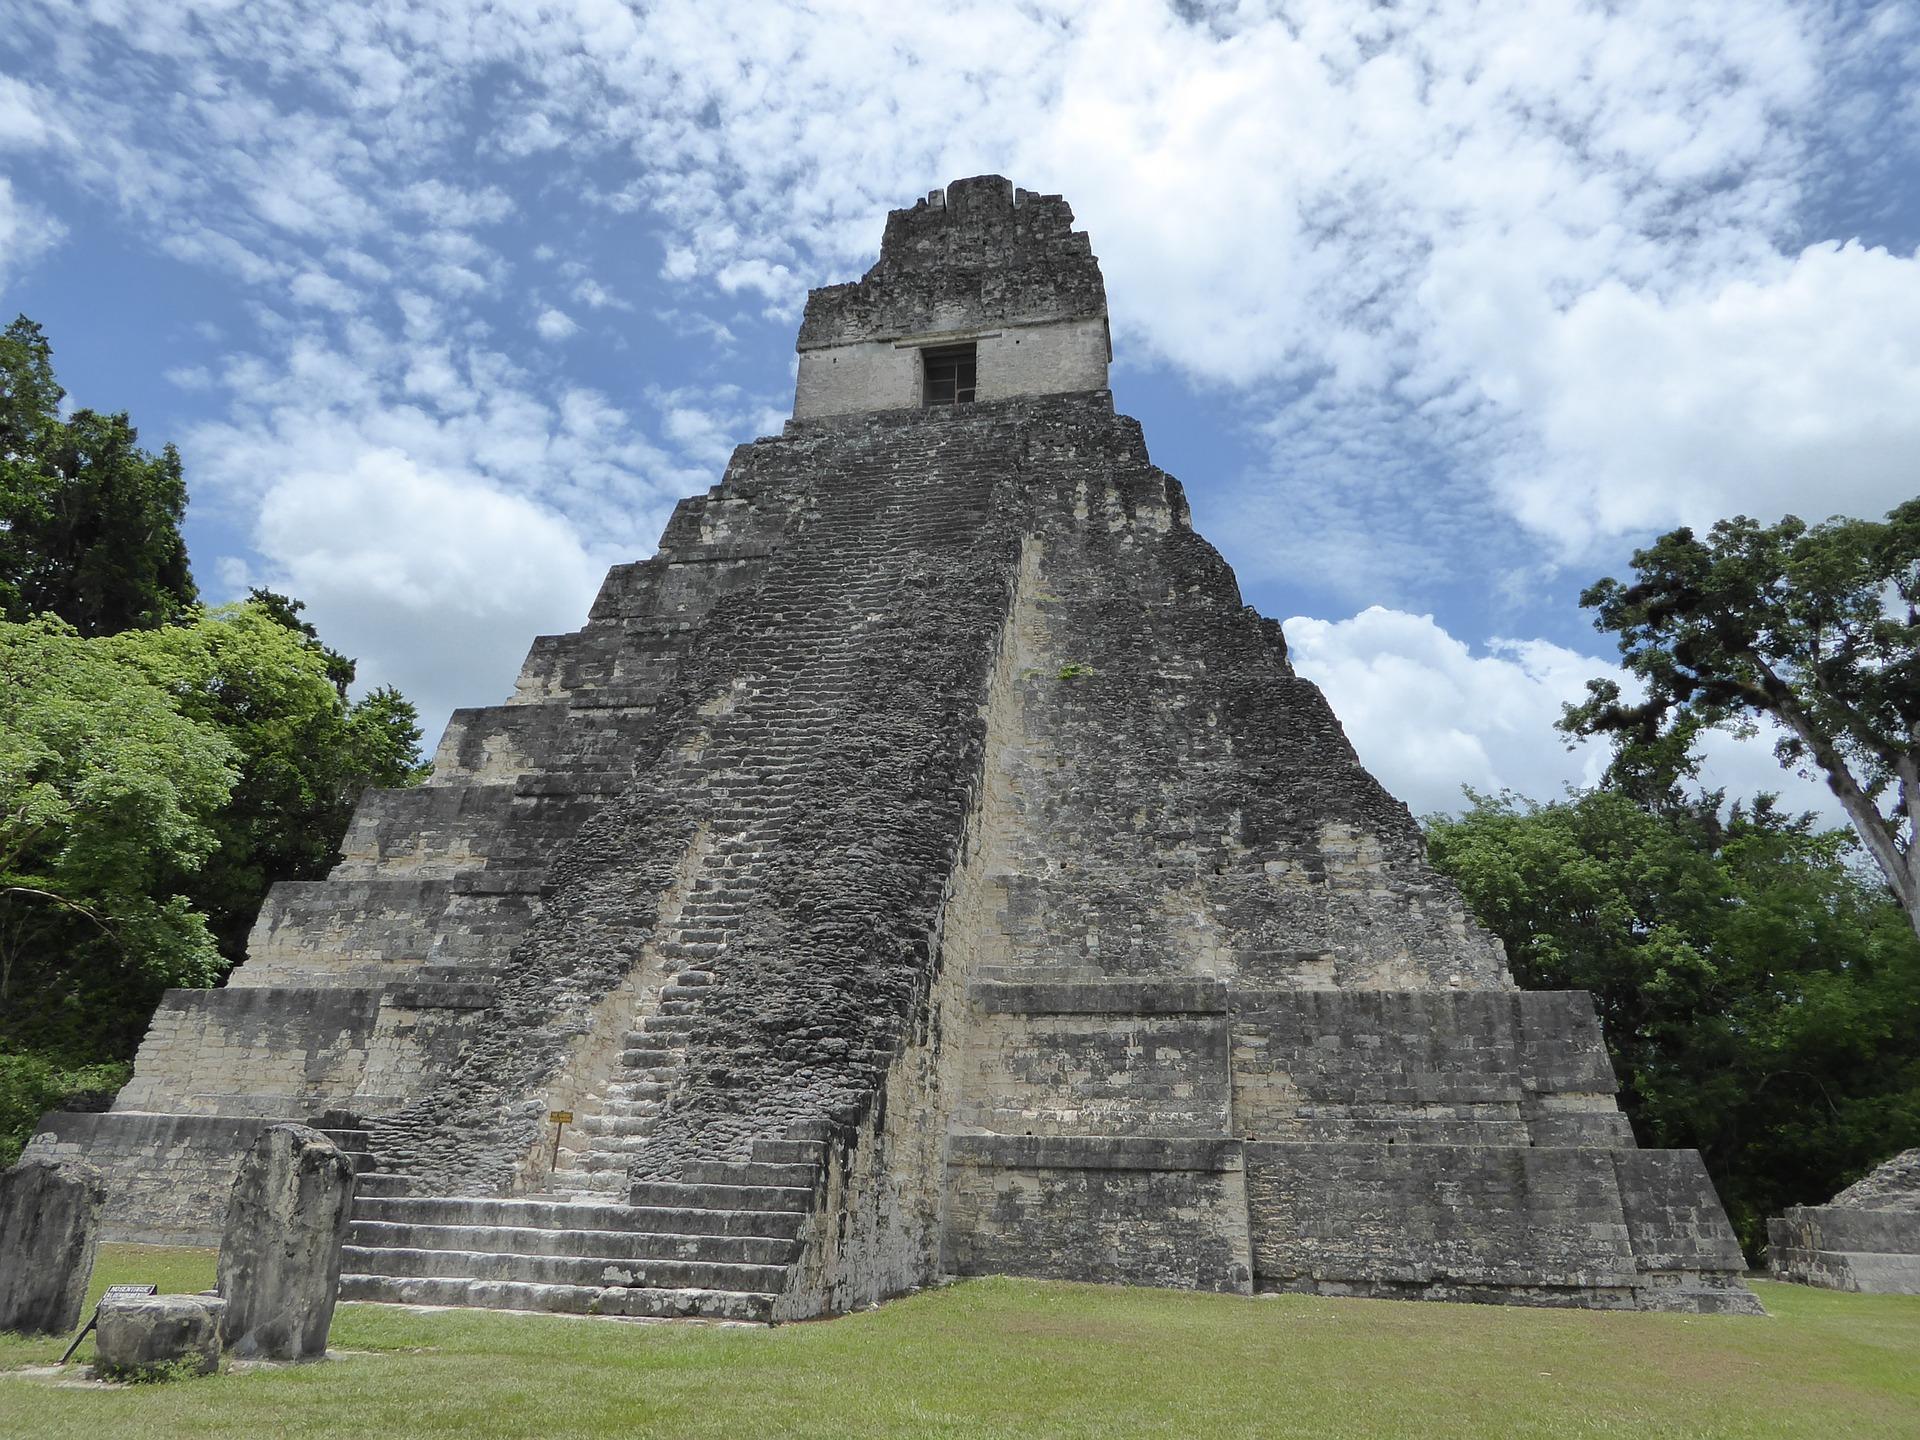 pyramid-maya-tikal-guatemala.jpg